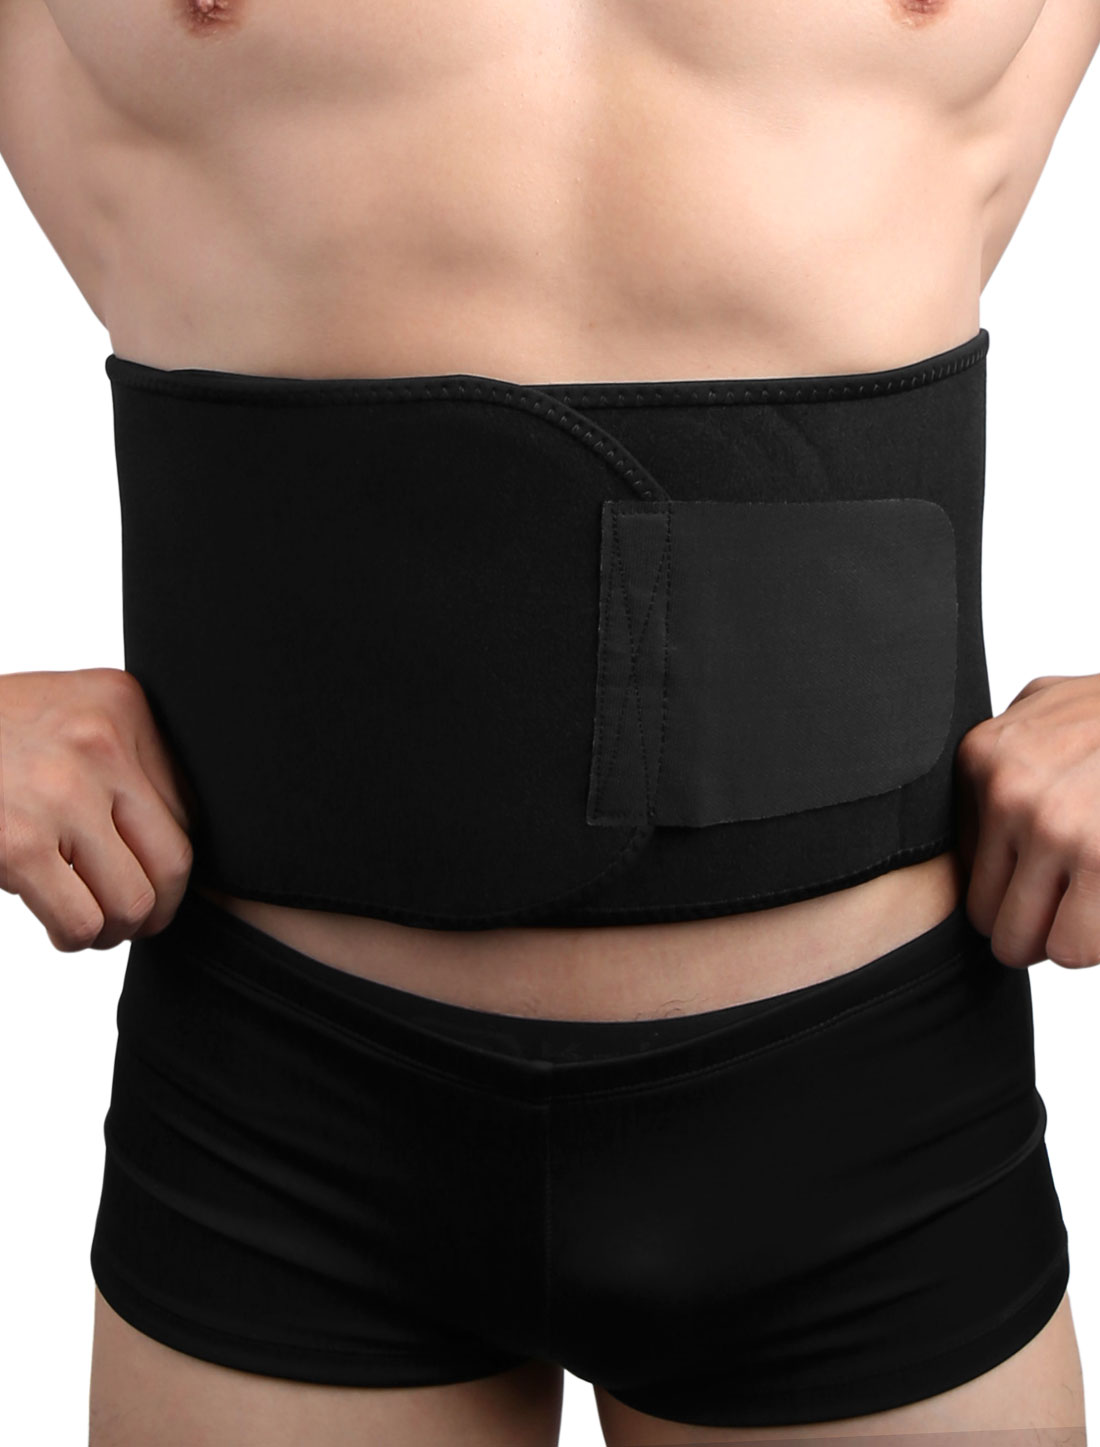 Men Women Black Waist Trimmer Slimming Tummy Belt Burn Fat Sweat Weight Loss Body Shaper by